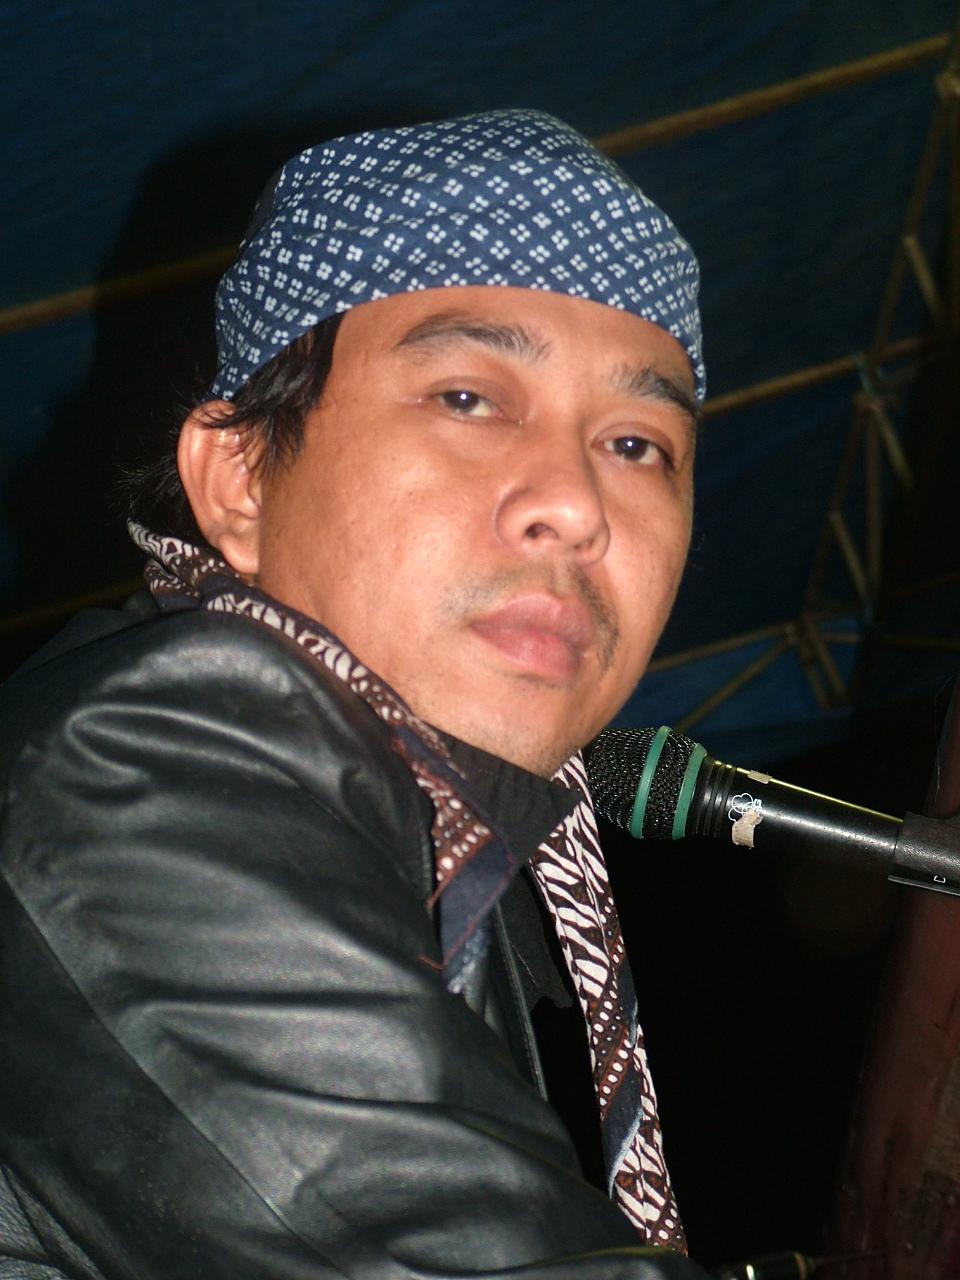 Taman Kota Tua Jakarta, 16 Juli 2011 Judul Judul Cerita Wayang Sunda